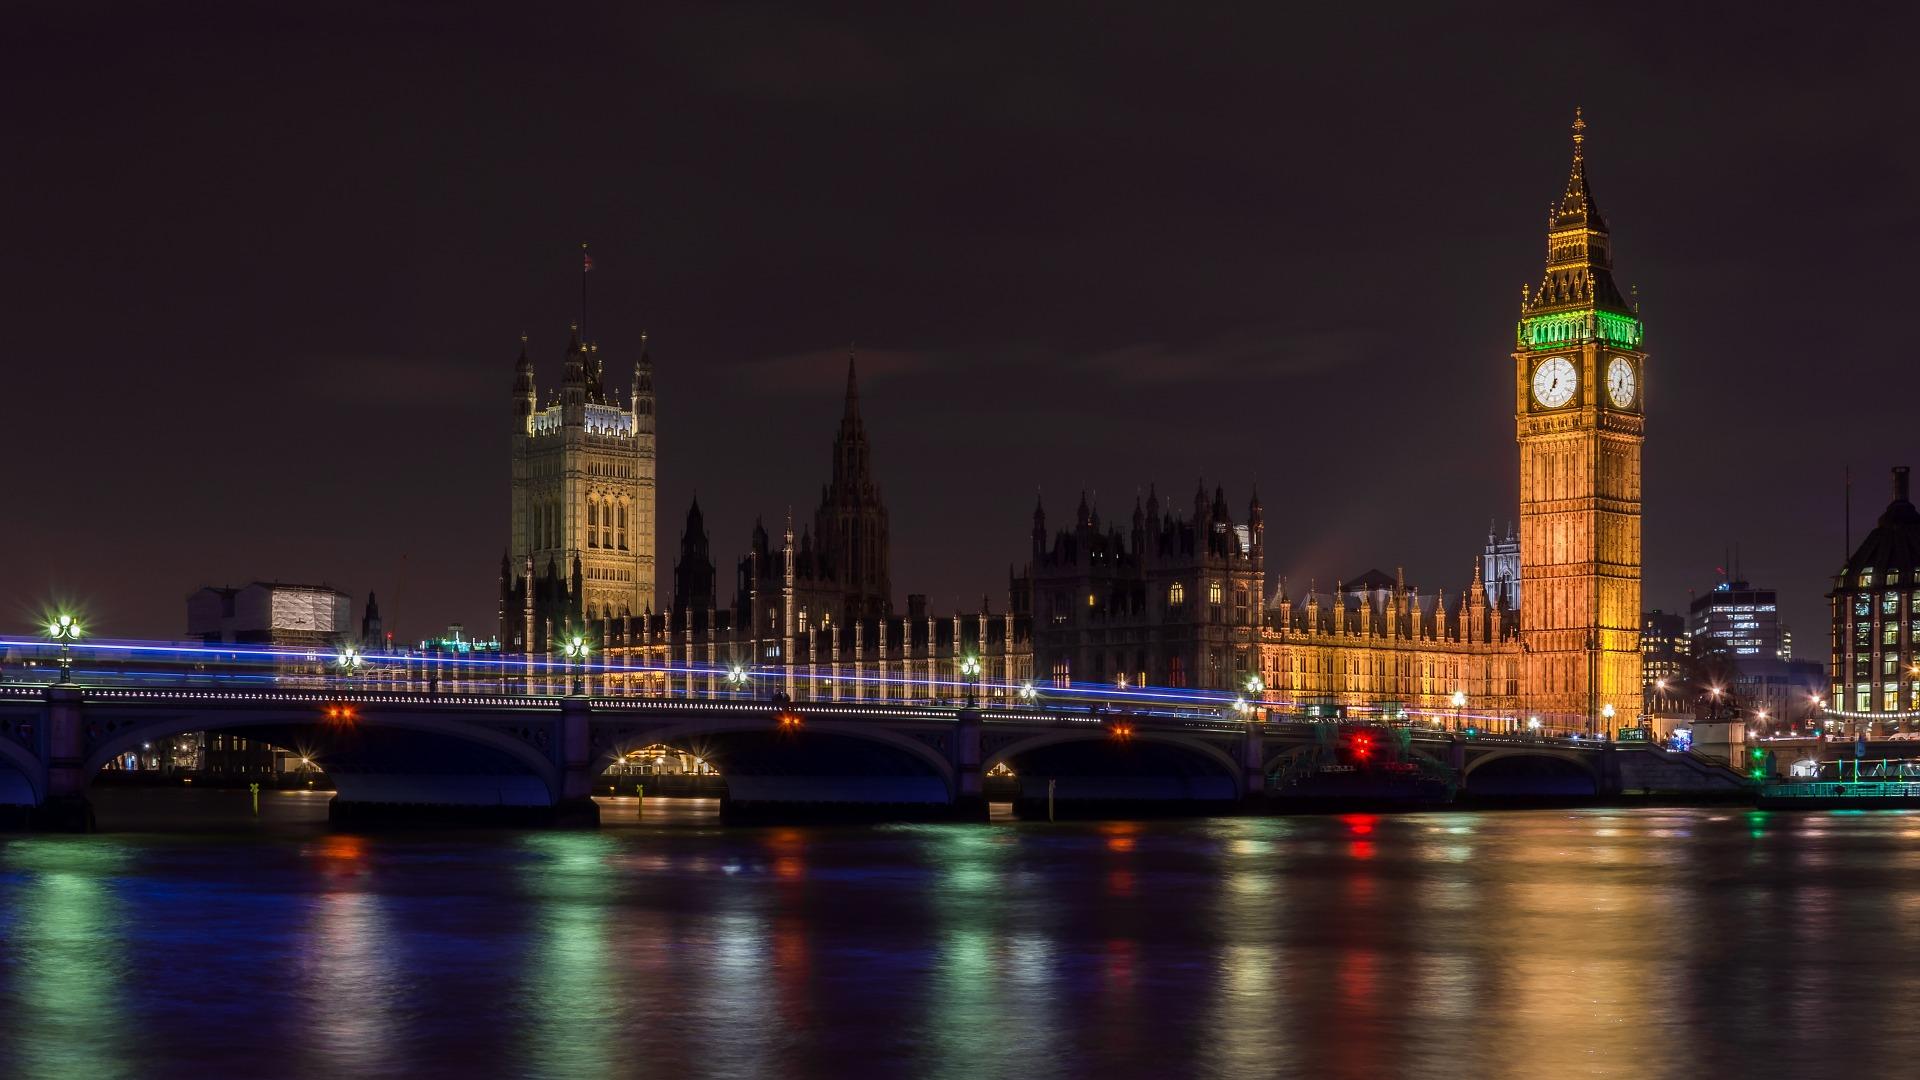 london-bridge-945499_1920 Future of Fund Distribution Under AIFMD